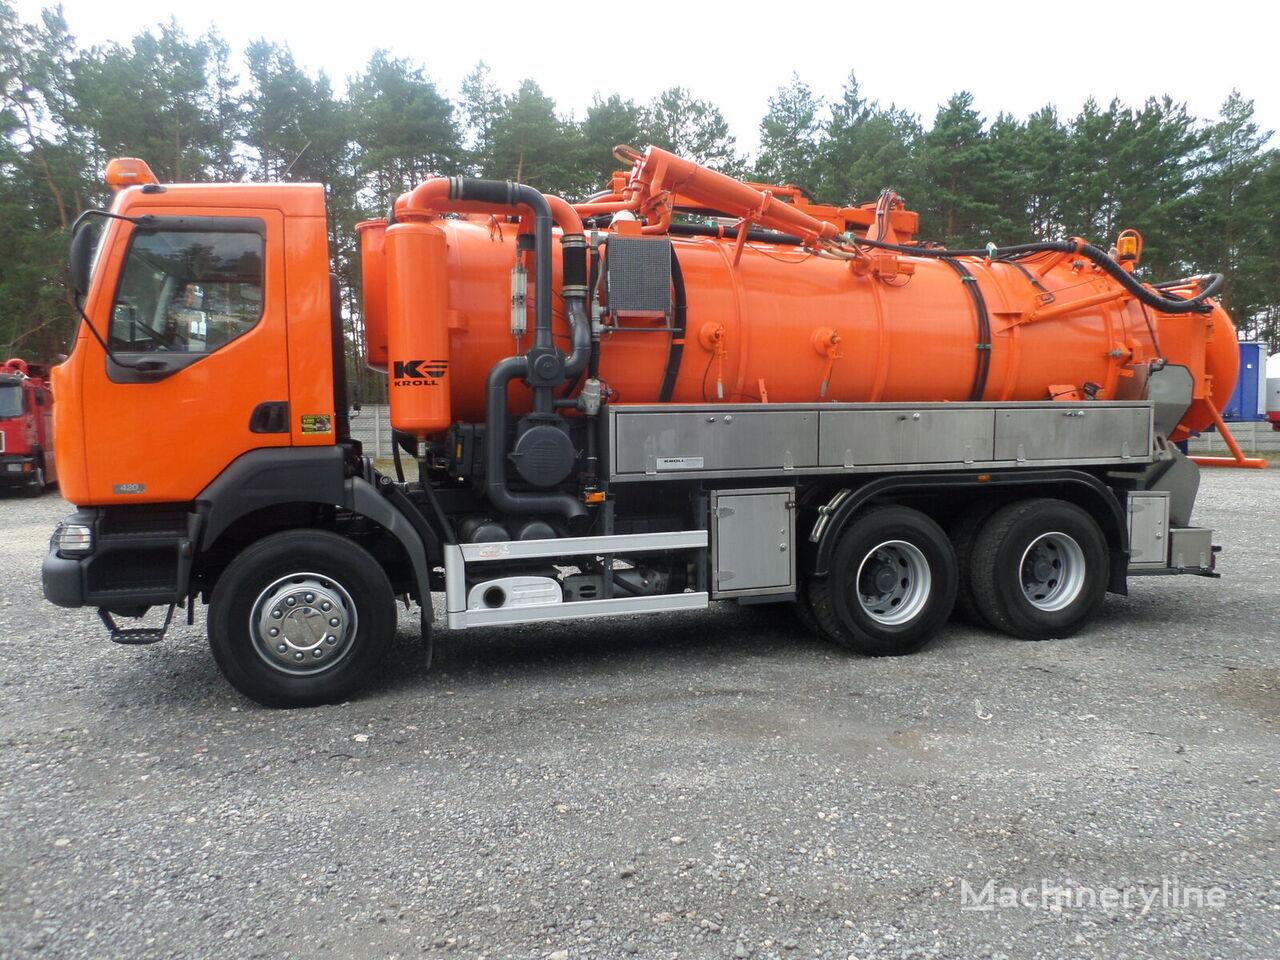 RENAULT KERAX 6x4 KROLL WUKO Water recycling kloakkbil